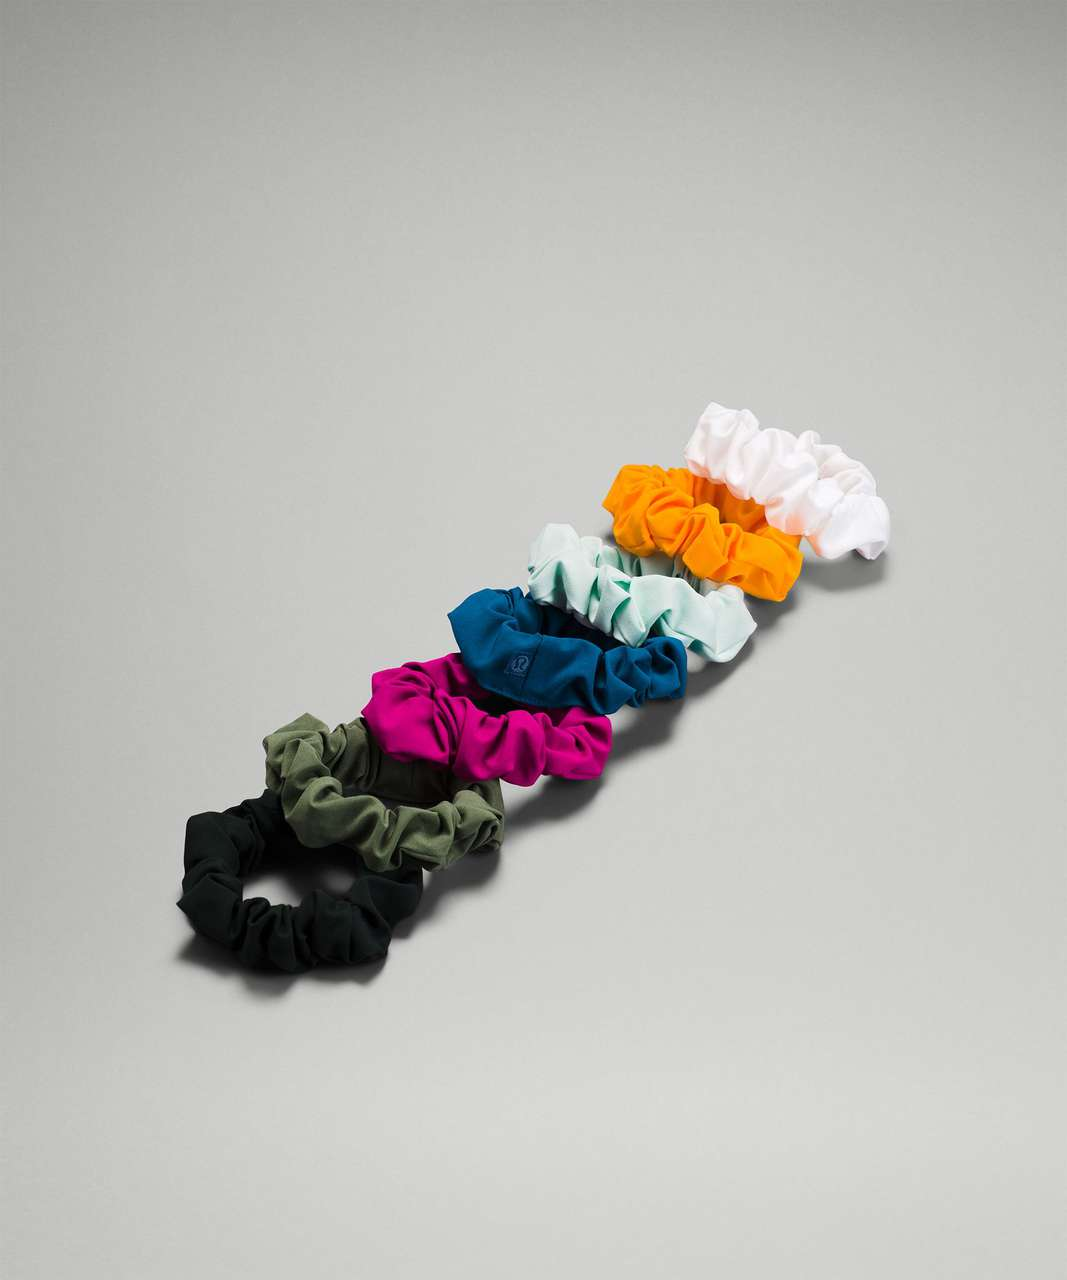 Lululemon Uplifting Scrunchie *7 Pack - Rainforest Green / Green Twill / Ripened Raspberry / Capri / Delicate Mint / Clementine / White